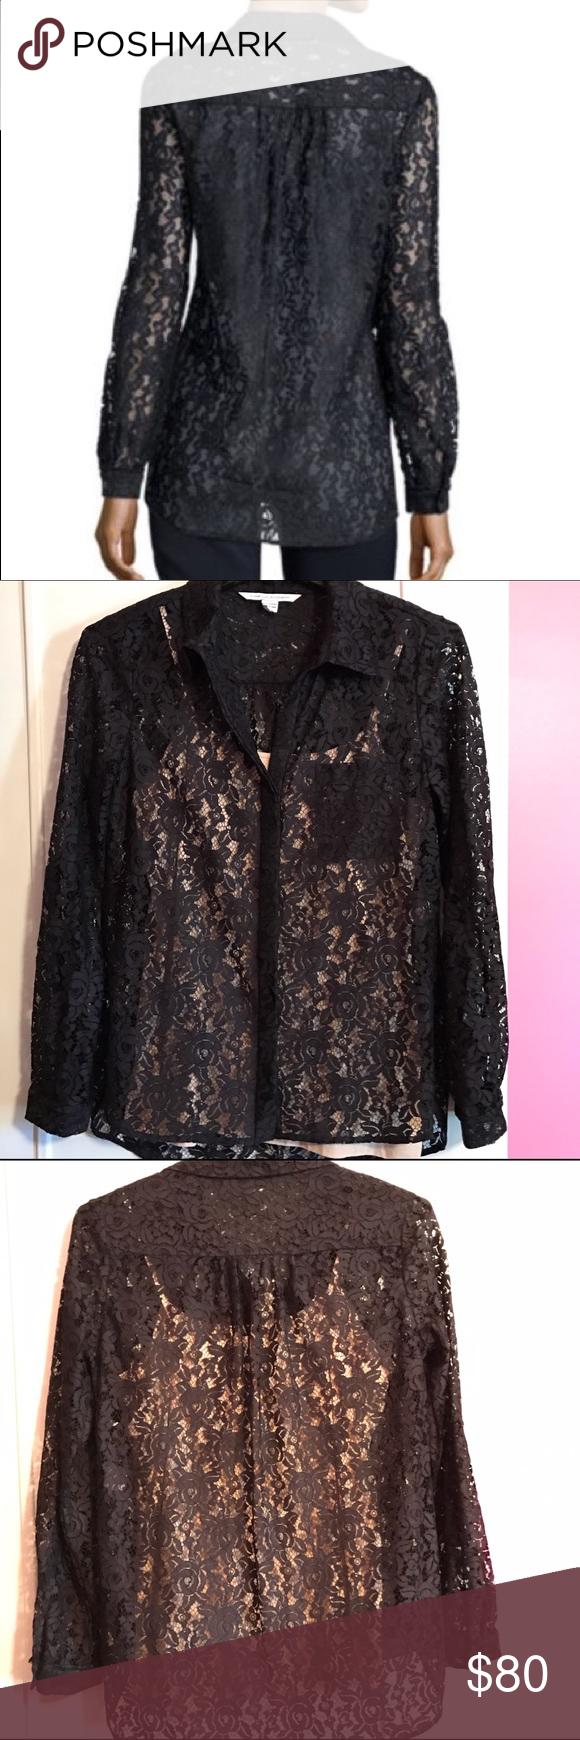 d143ca45fed72 DVF Black Lace Lorelei Two Sheer Button Up Top Absolutely stunning Diane  von Furstenberg black sheer